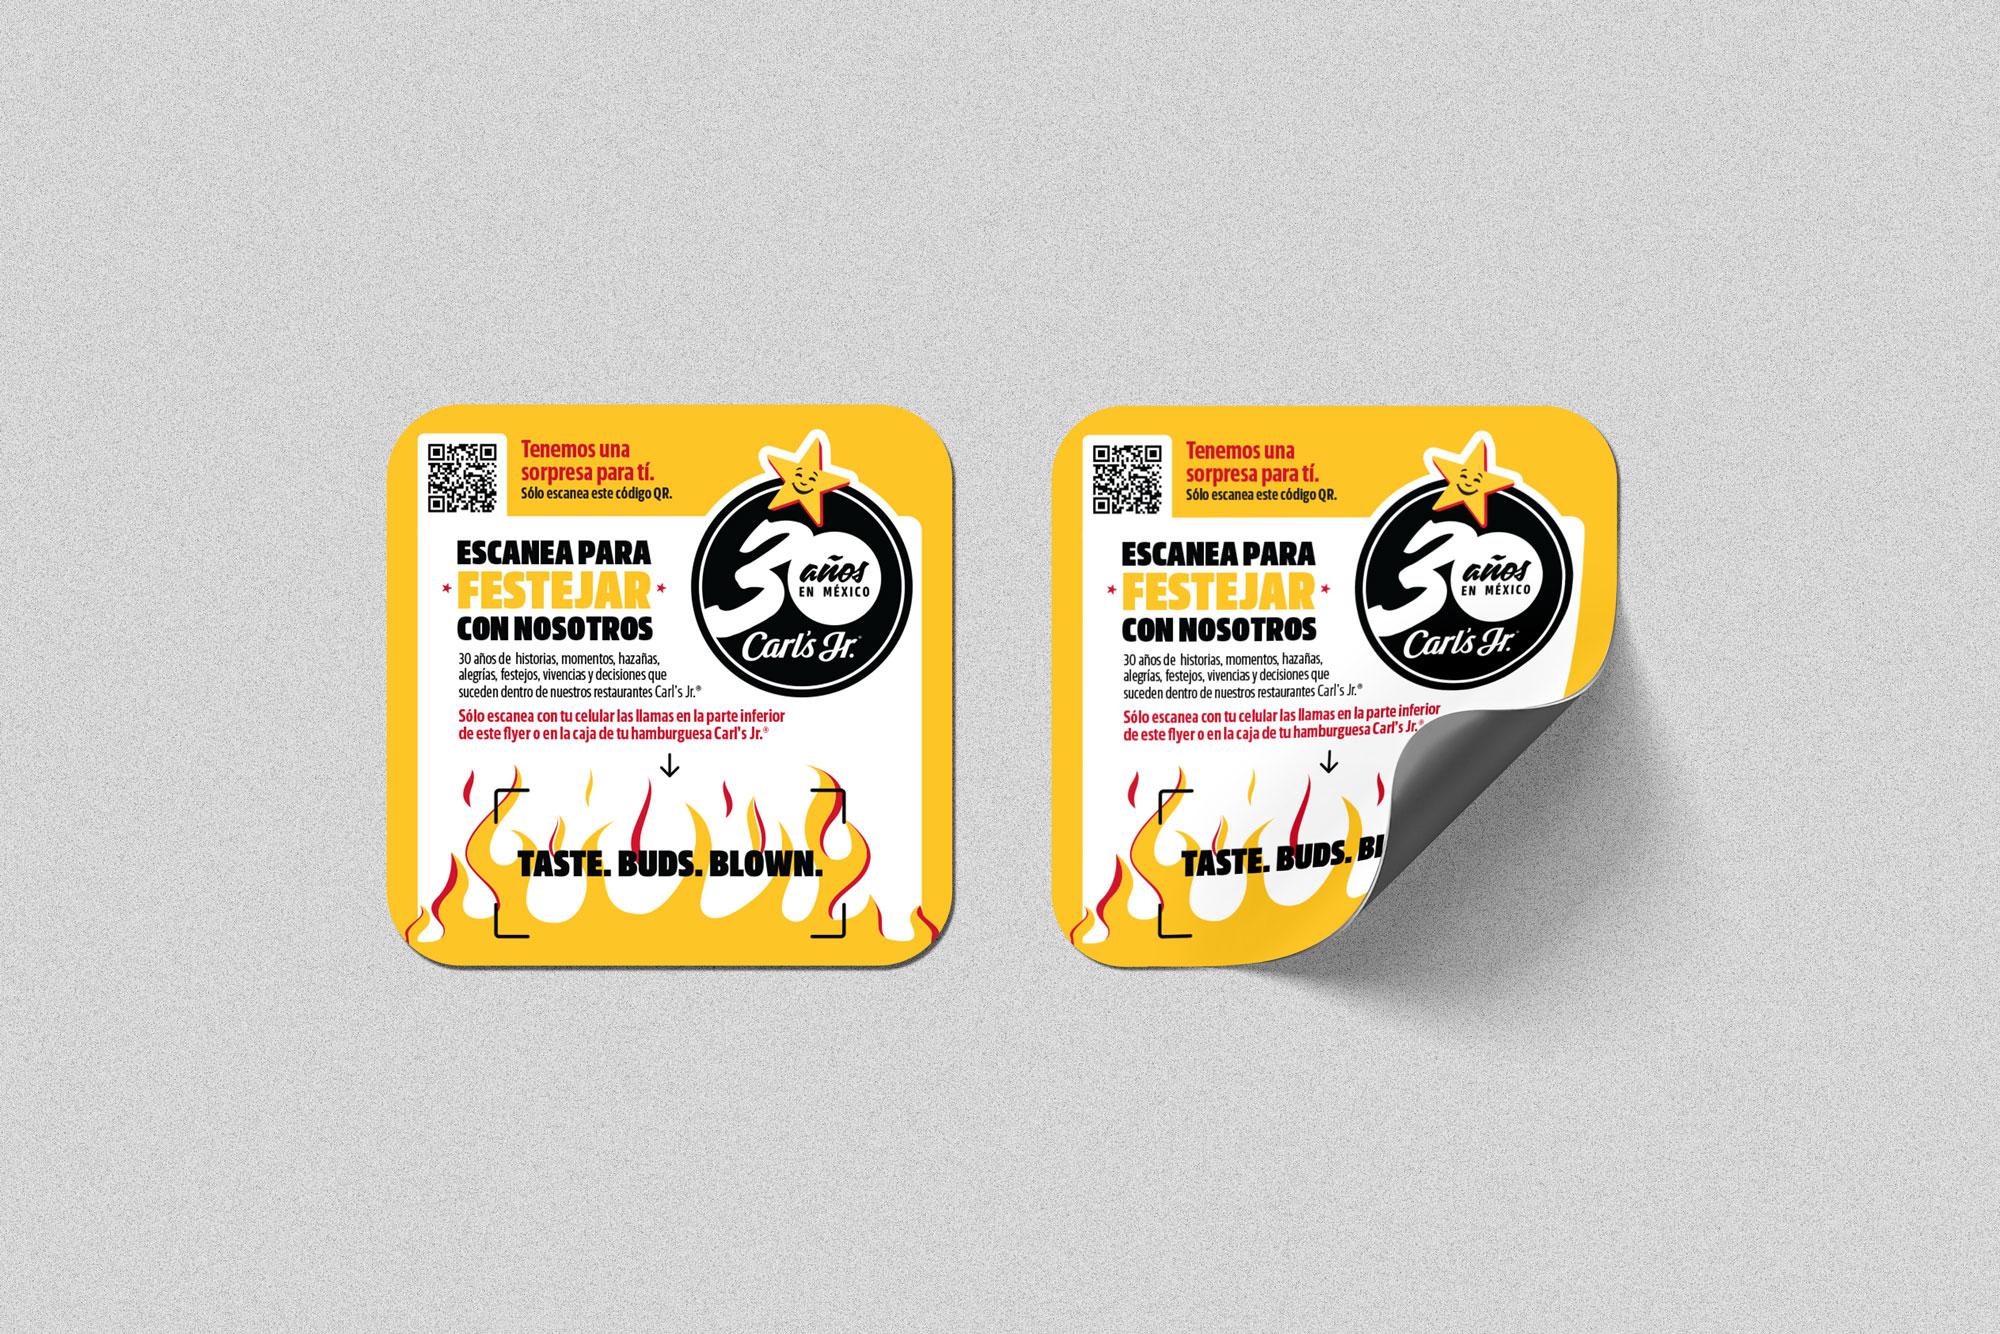 carlsjr_30-aniversario_sticker_mesa_cuadrados-25cm